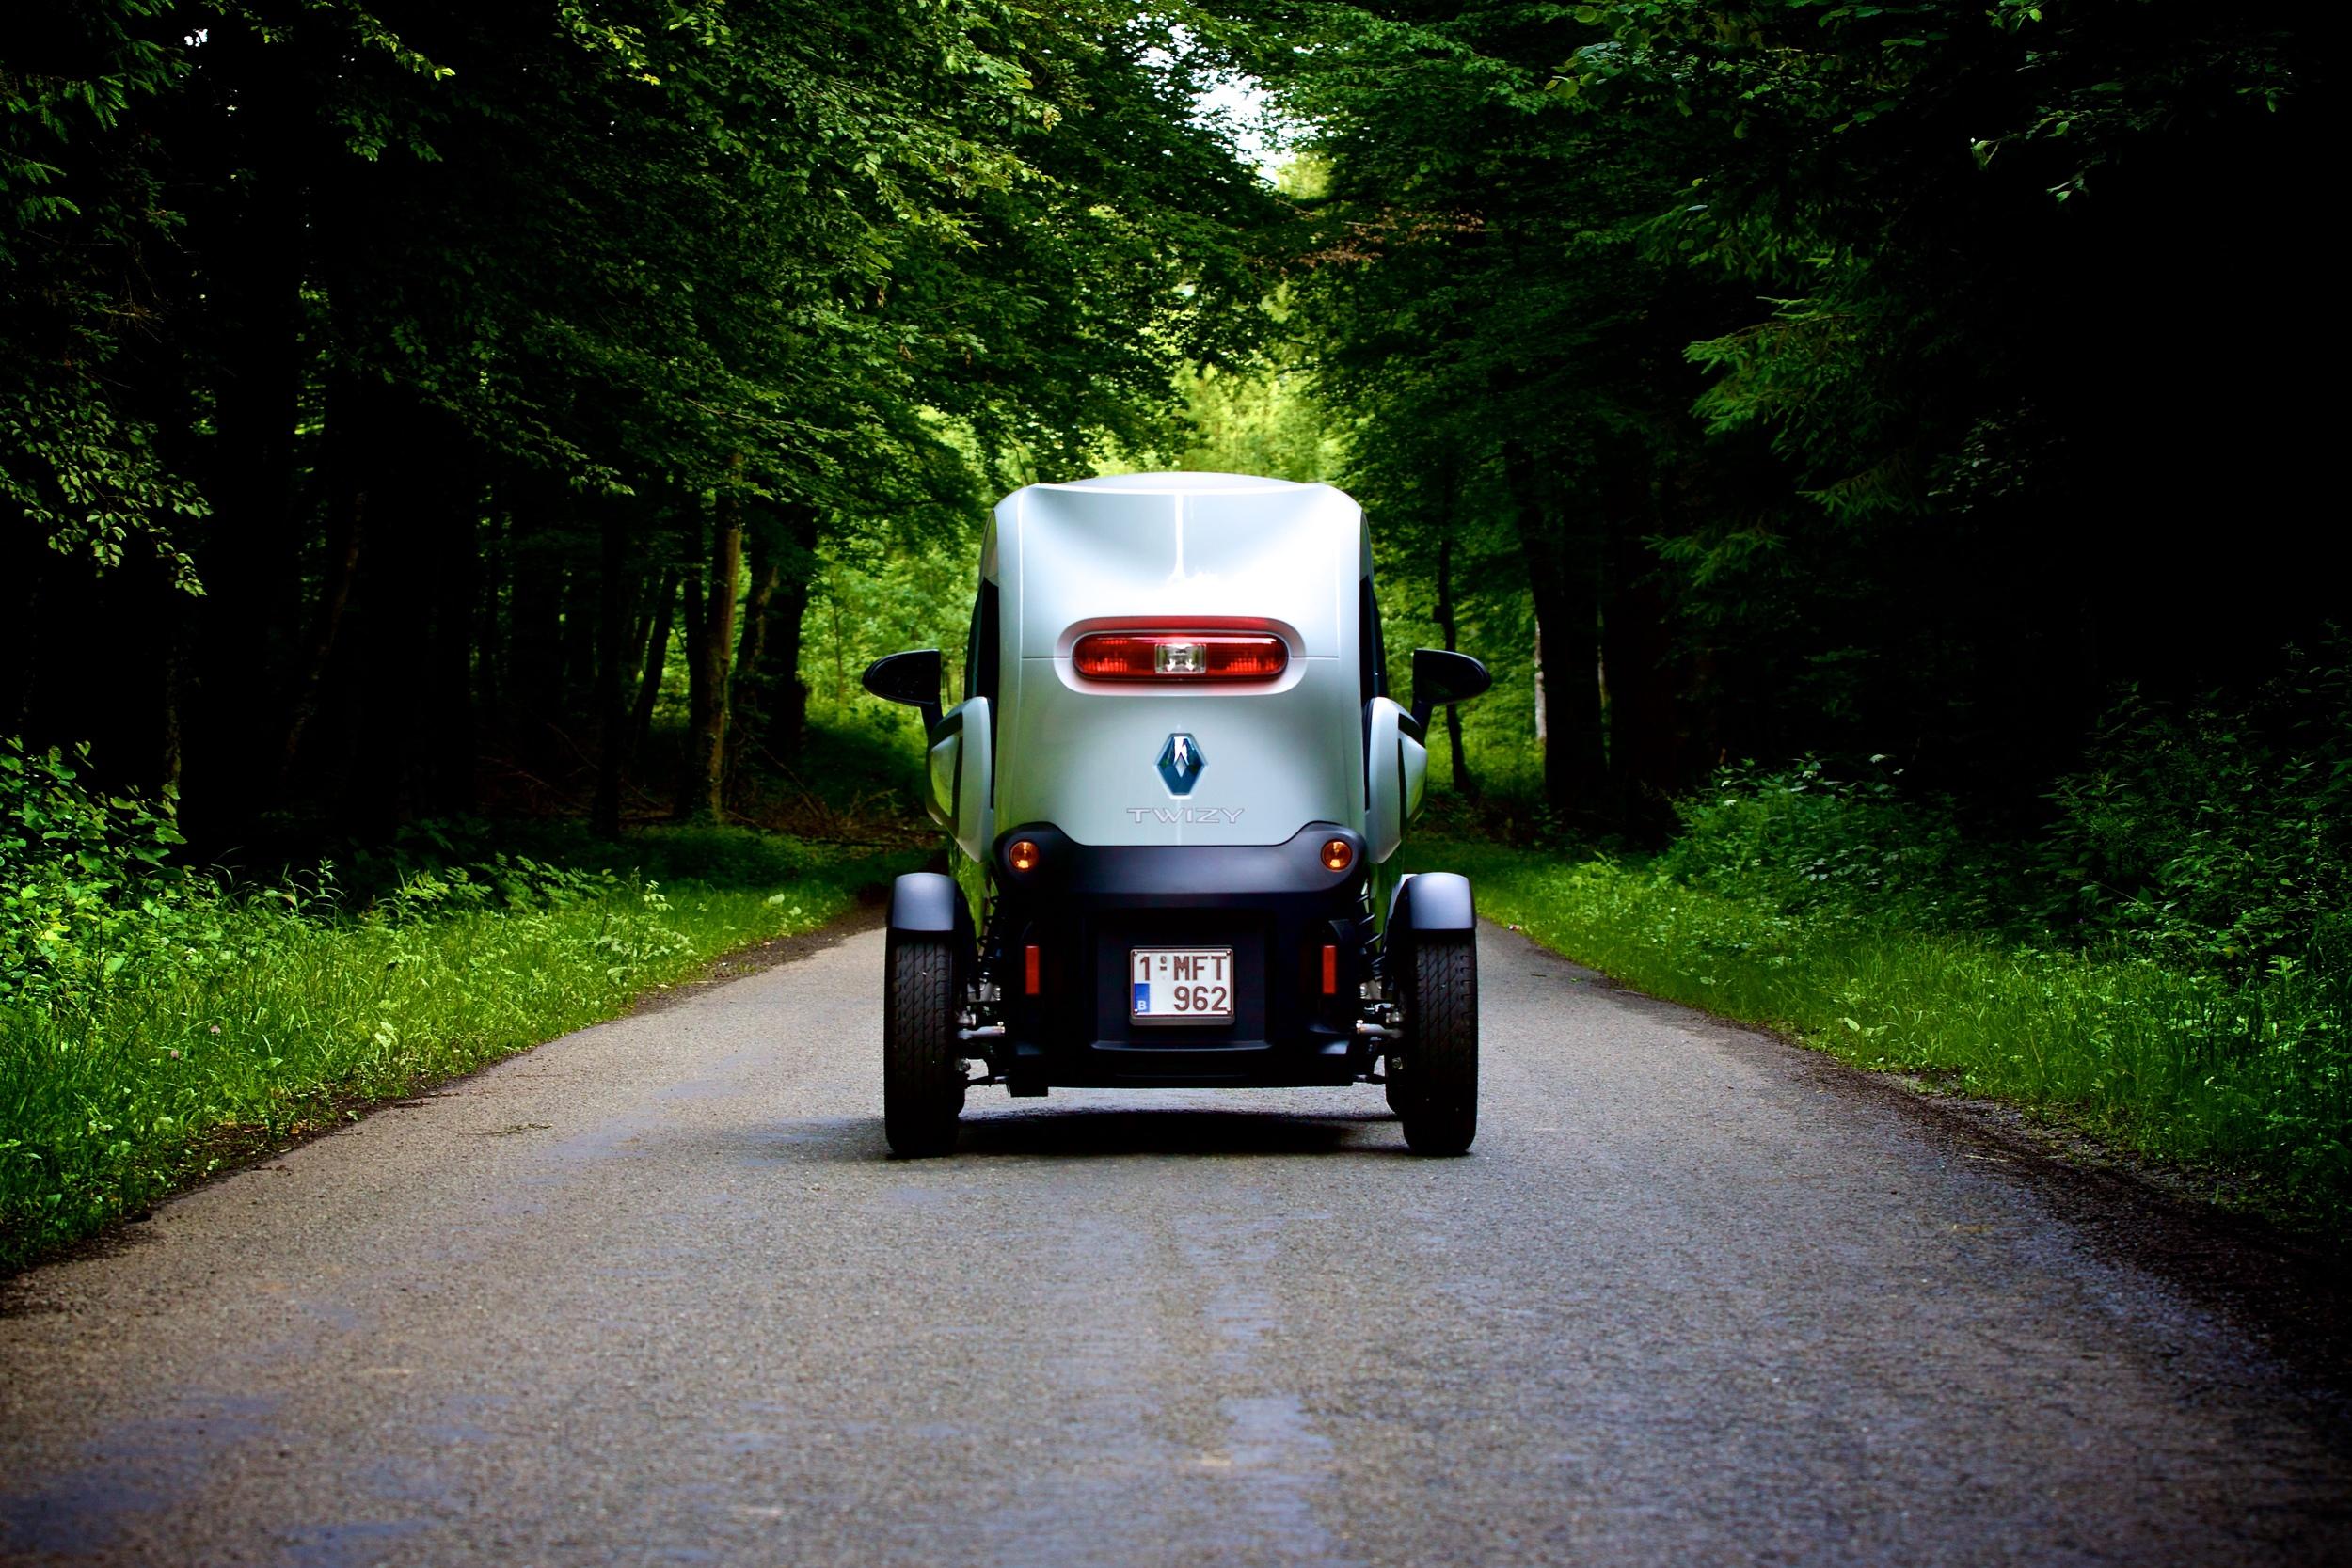 renault-twizy-30-juin-2012-140.jpg